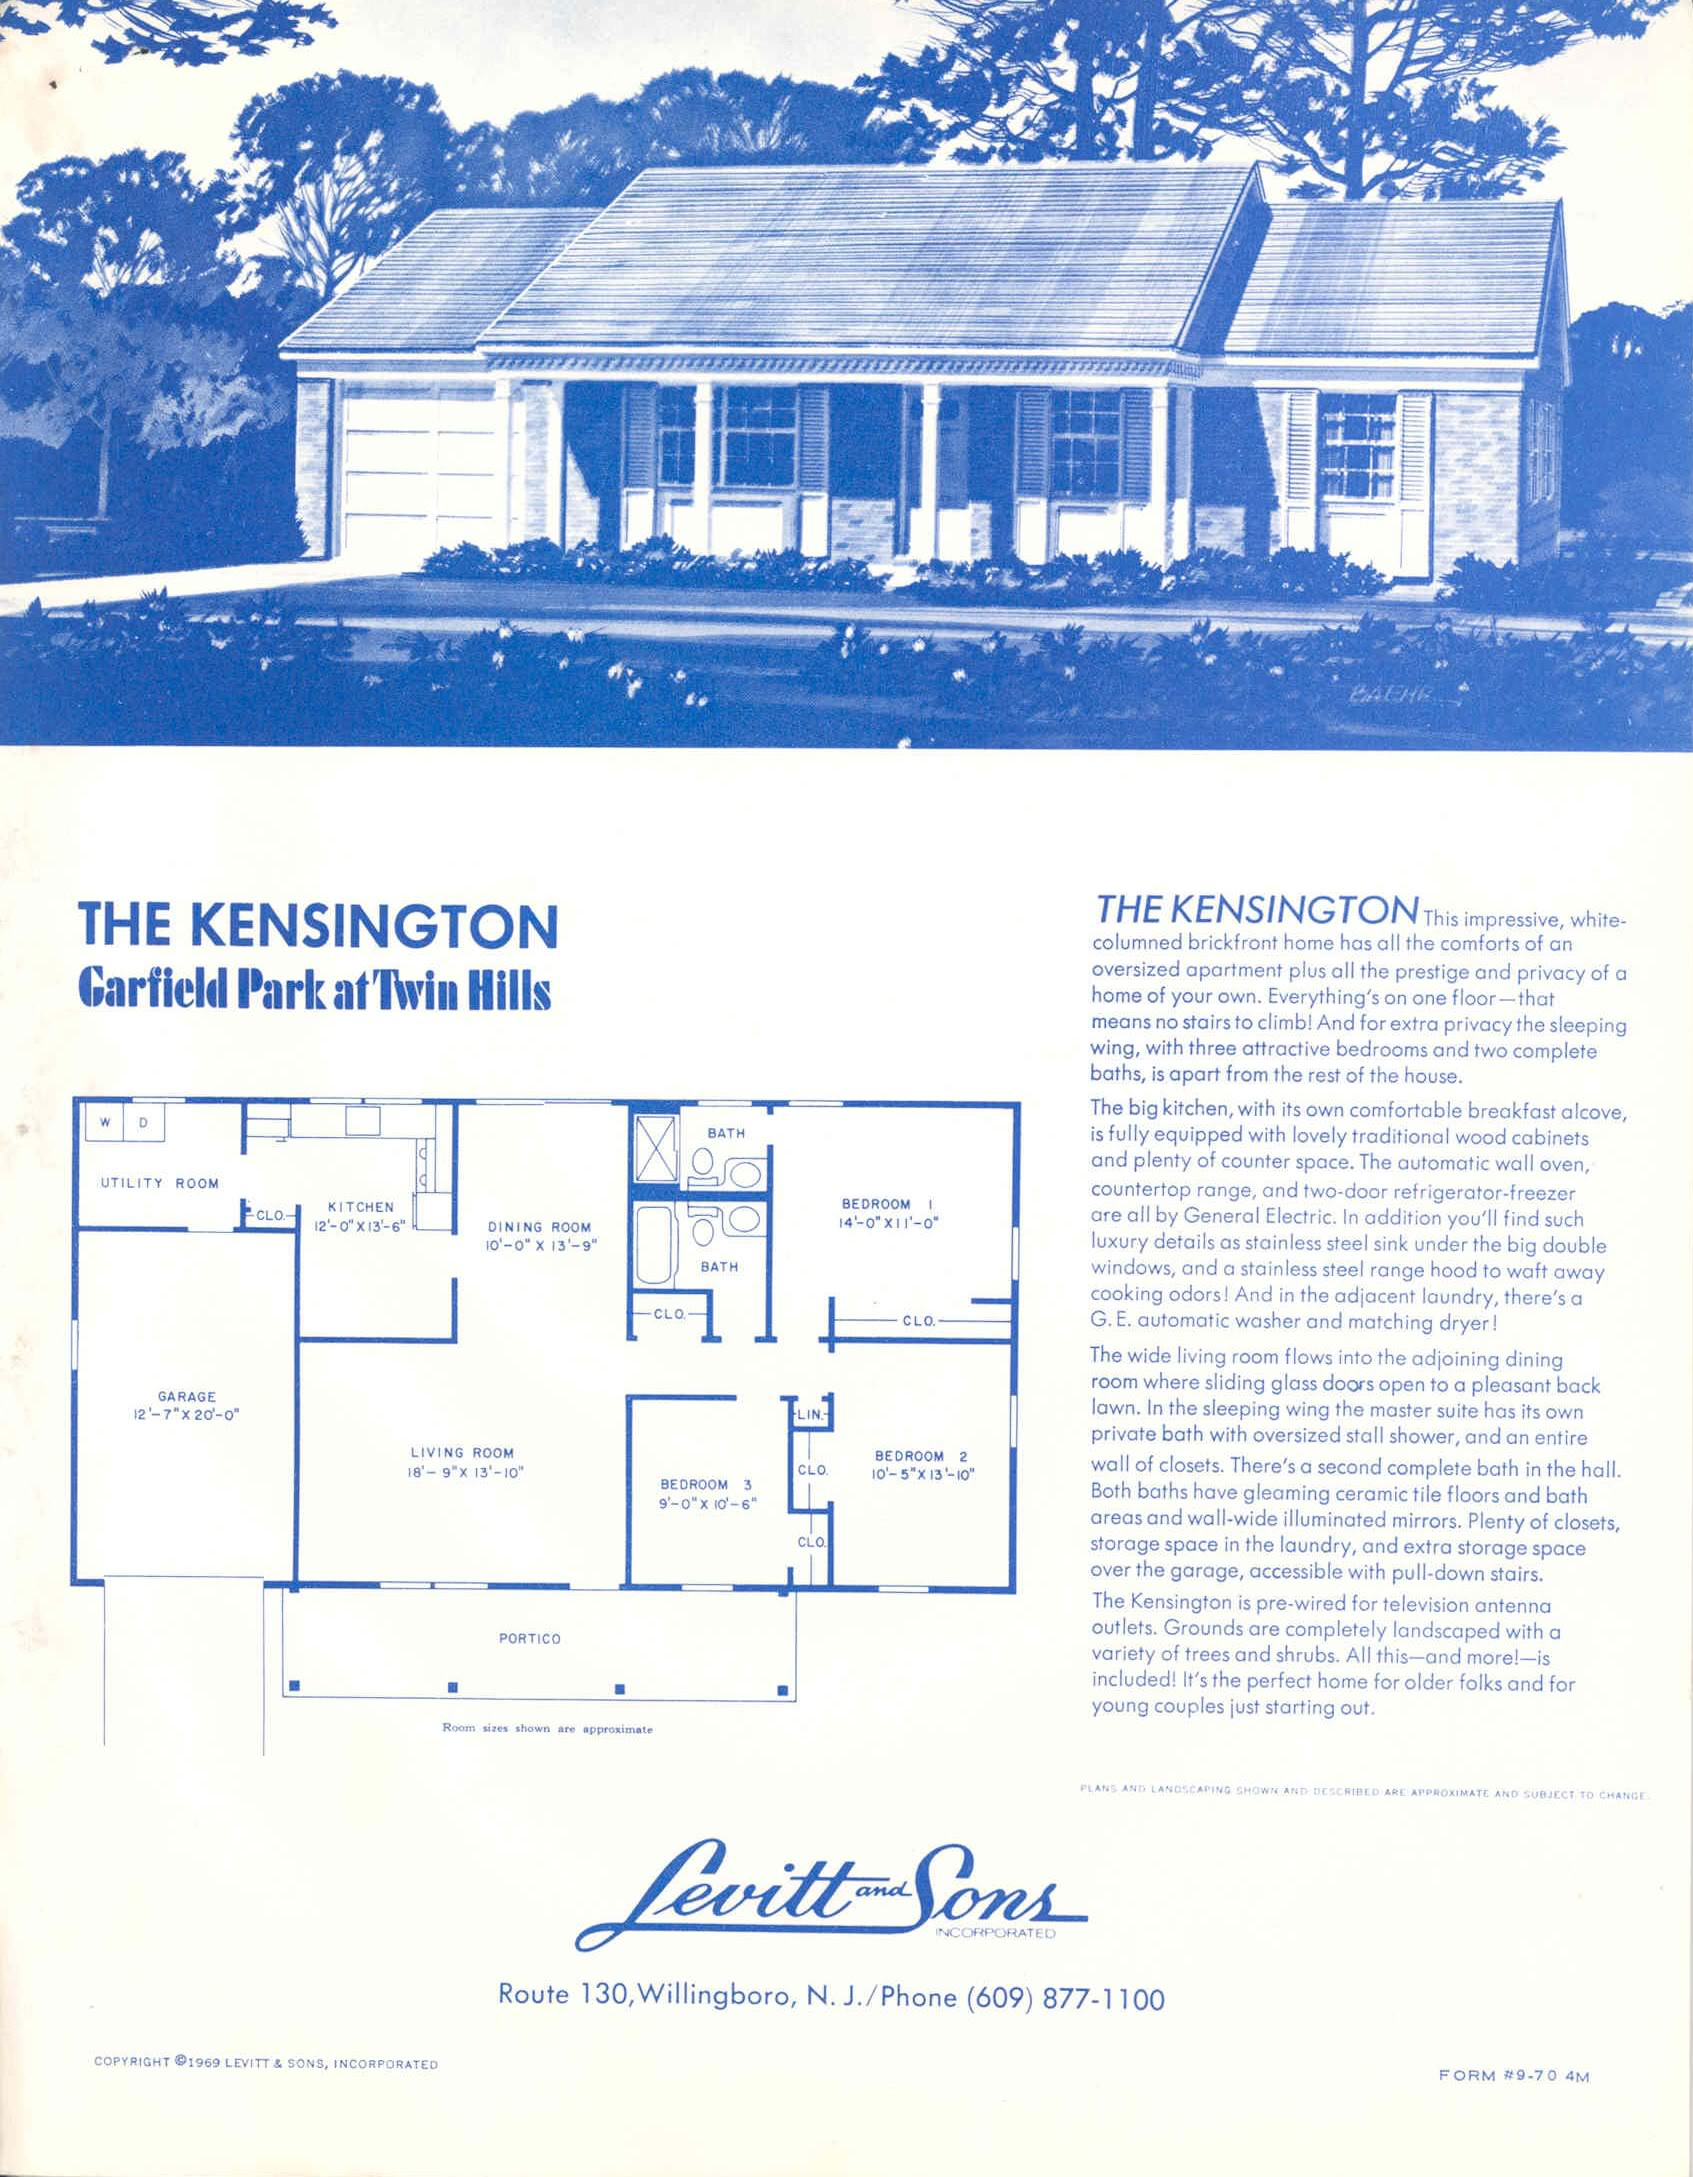 Kensington-Glover